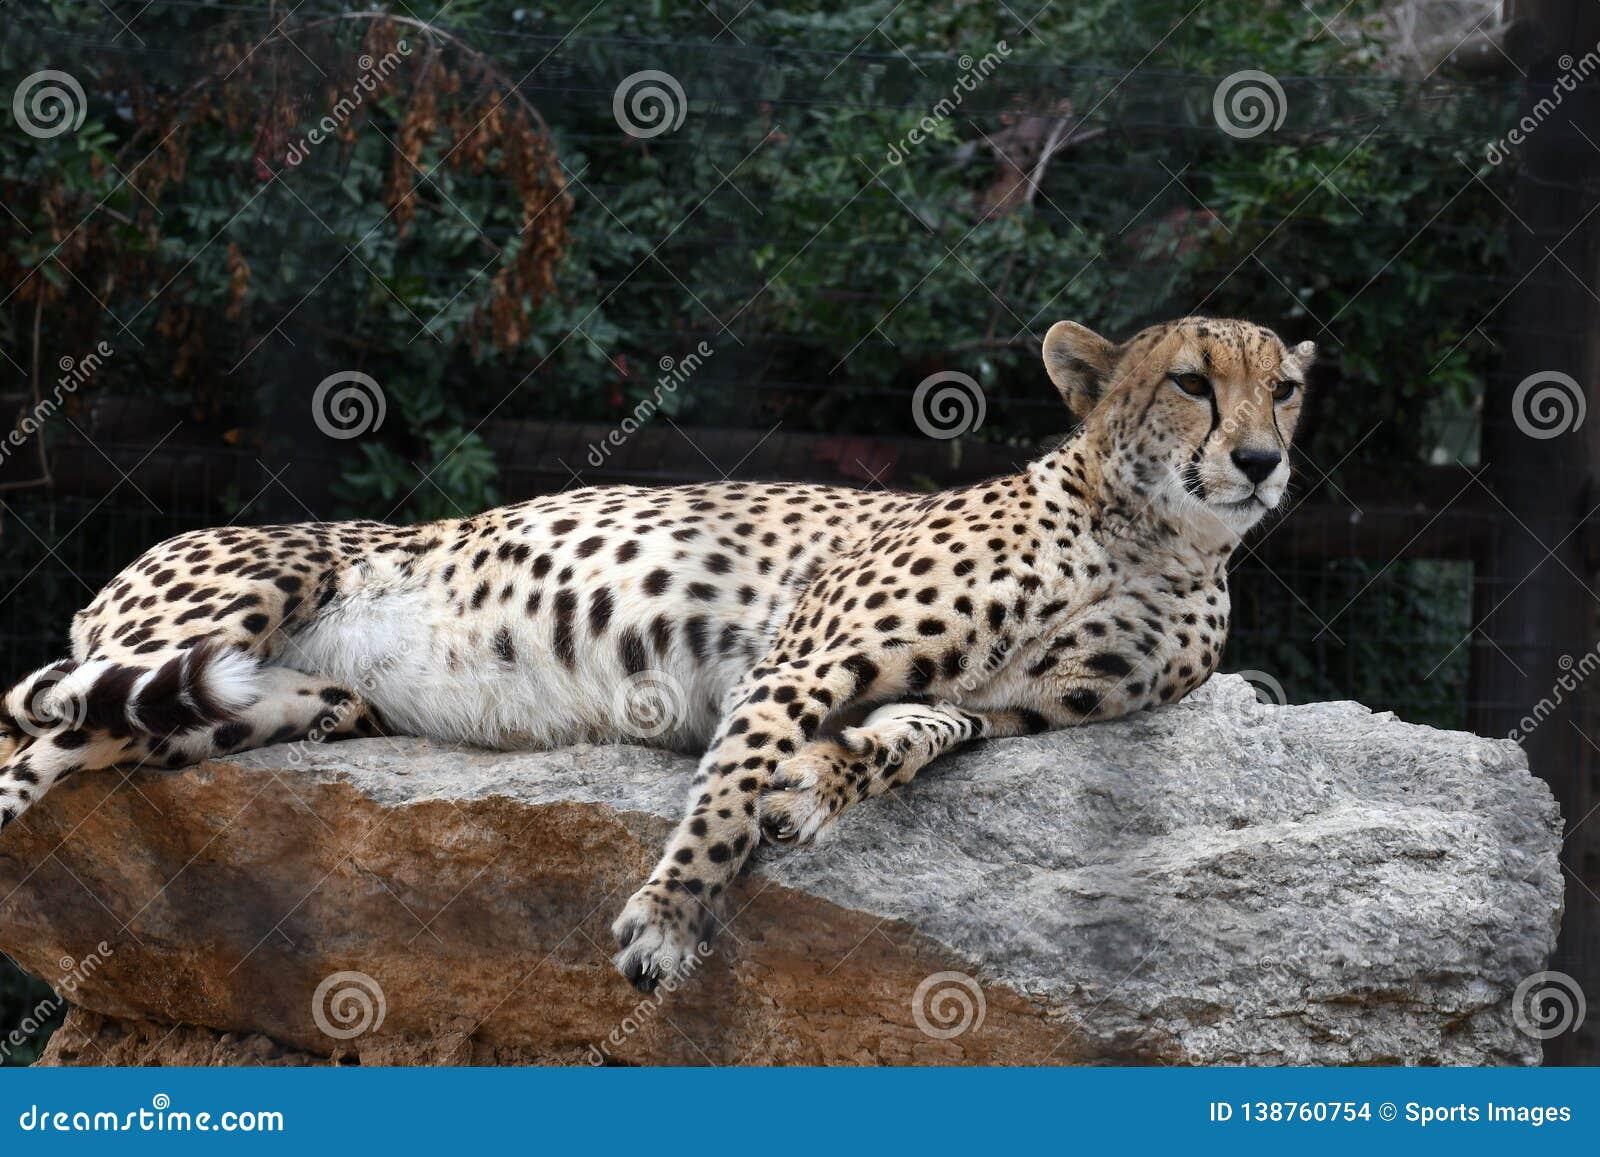 Simple Iran Flag Vector Illustration Stock Illustration ... |Iranian Cheetah Vector